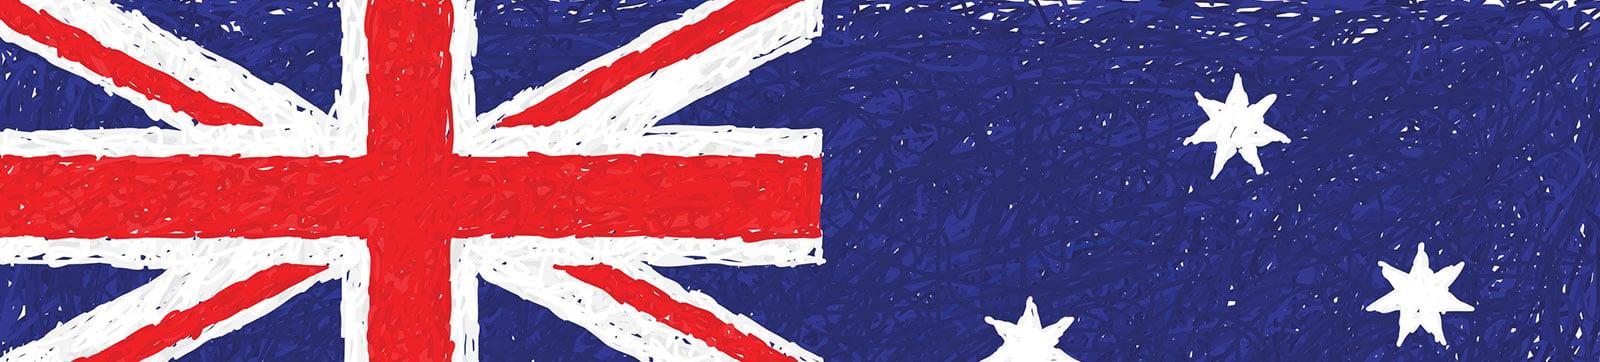 australia-flag-top-image-template.jpg